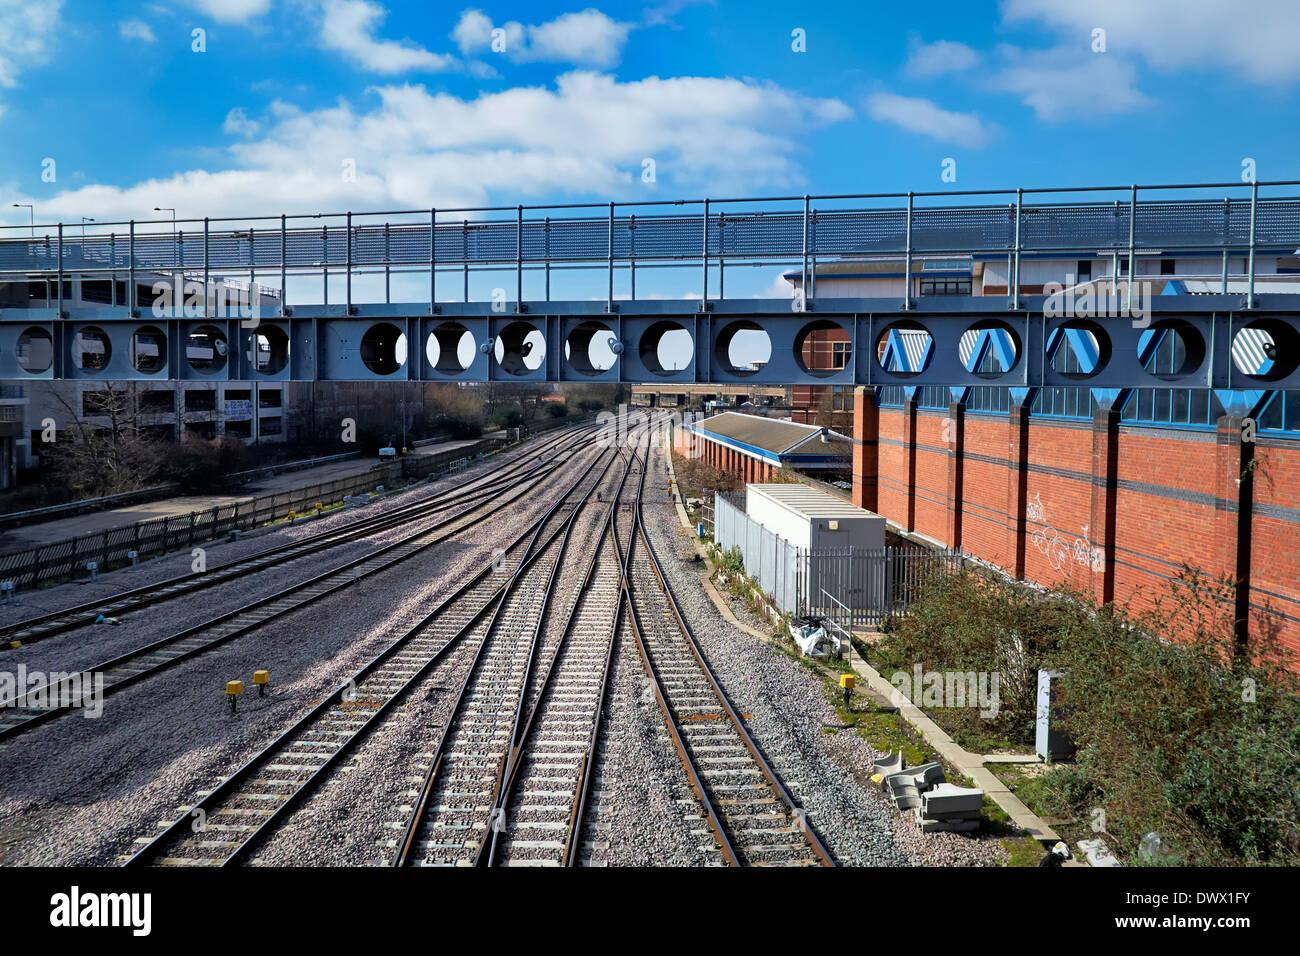 The railway lines that approach Nottingham midland railway station England uk - Stock Image